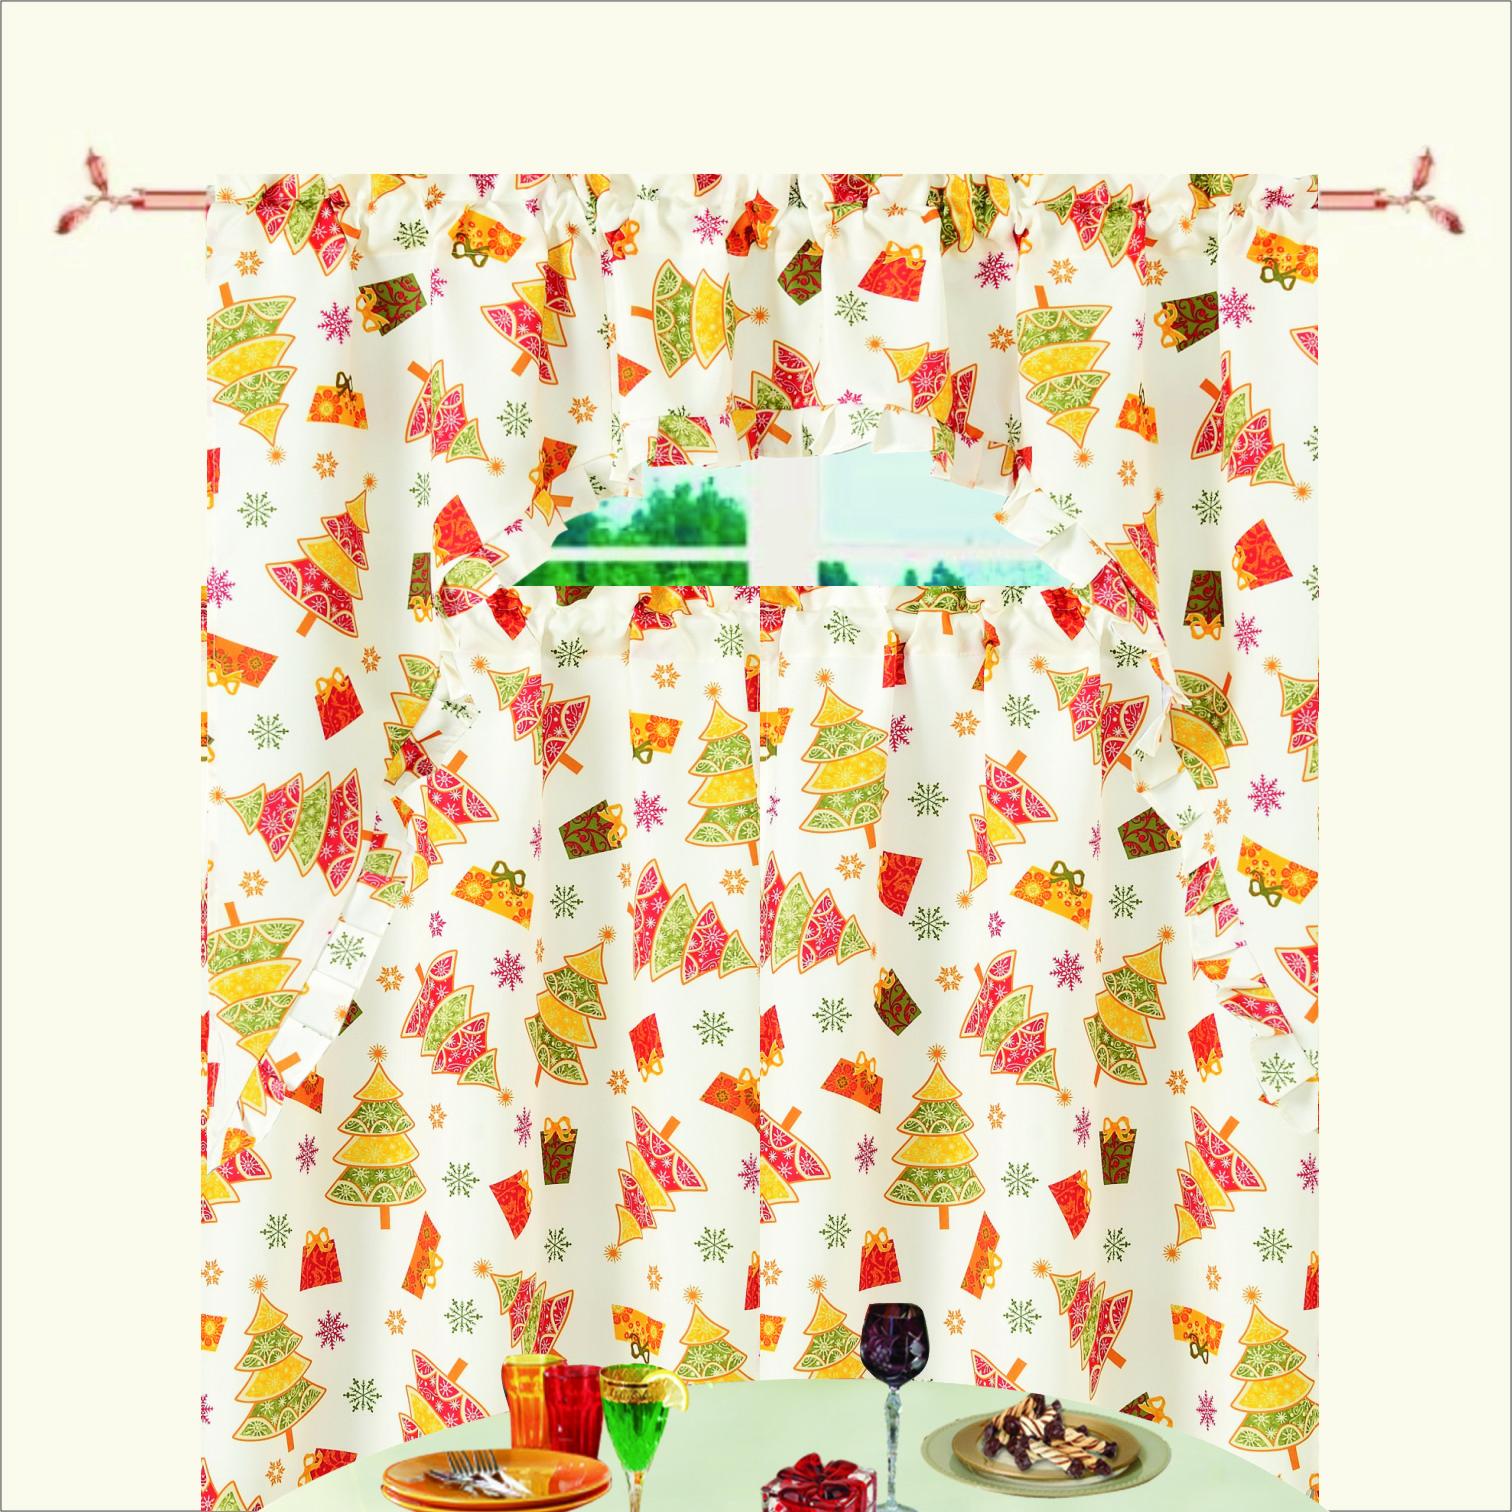 Kitchen Christmas Curtains Amazon Com: Christmas Poinsettia Design 3pc Kitchen Curtain Set (36*60